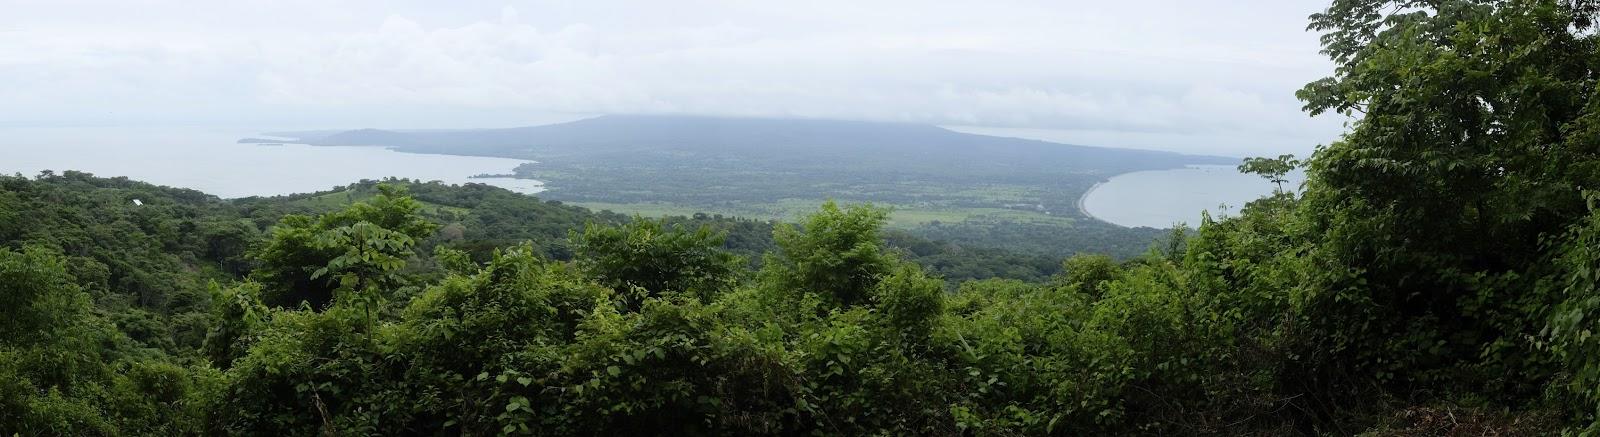 vue du volcan Maderas